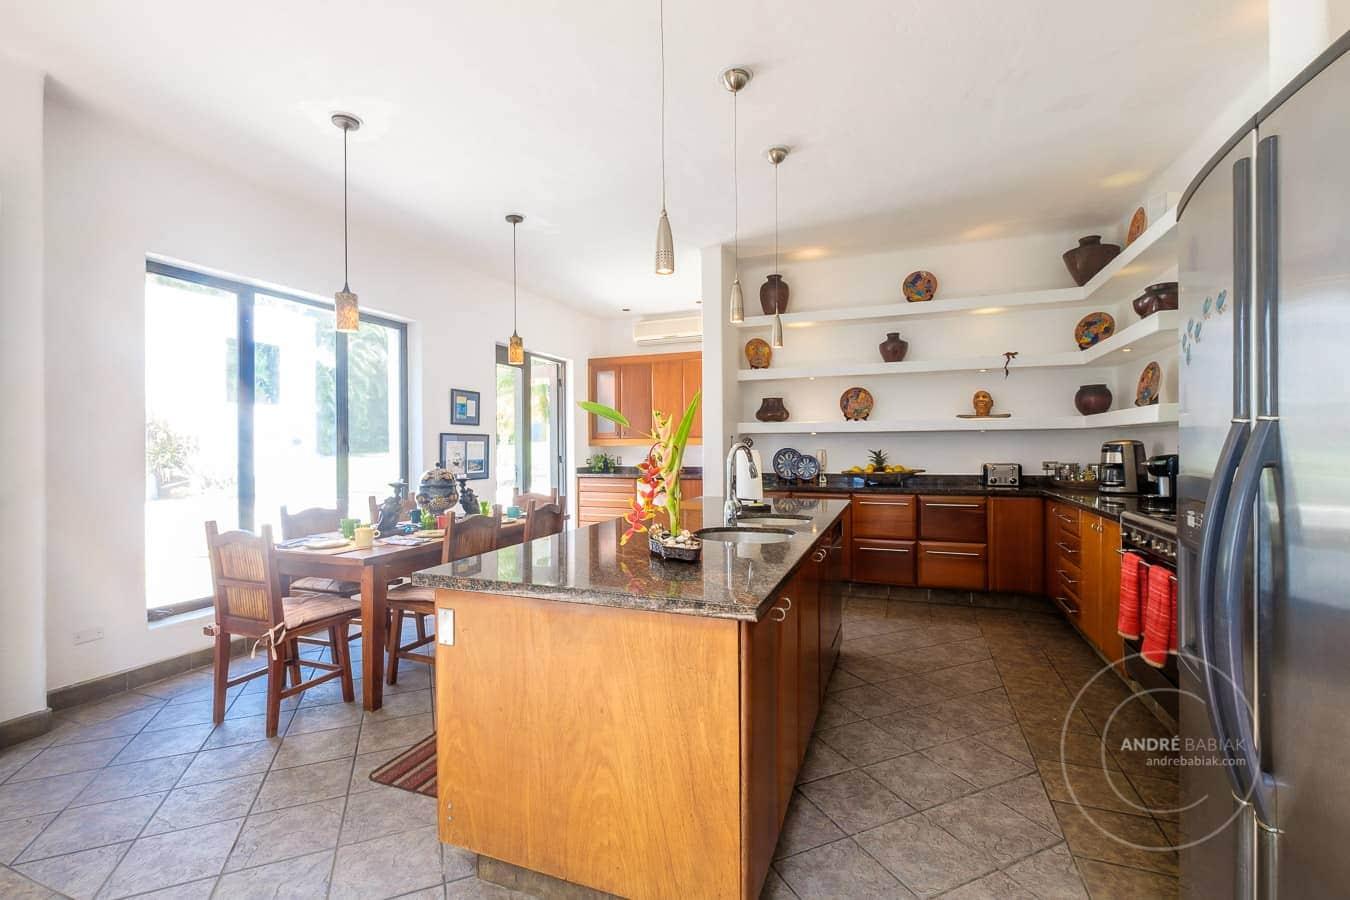 Architecture And Real Estate Photographer Puerto Vallarta 19